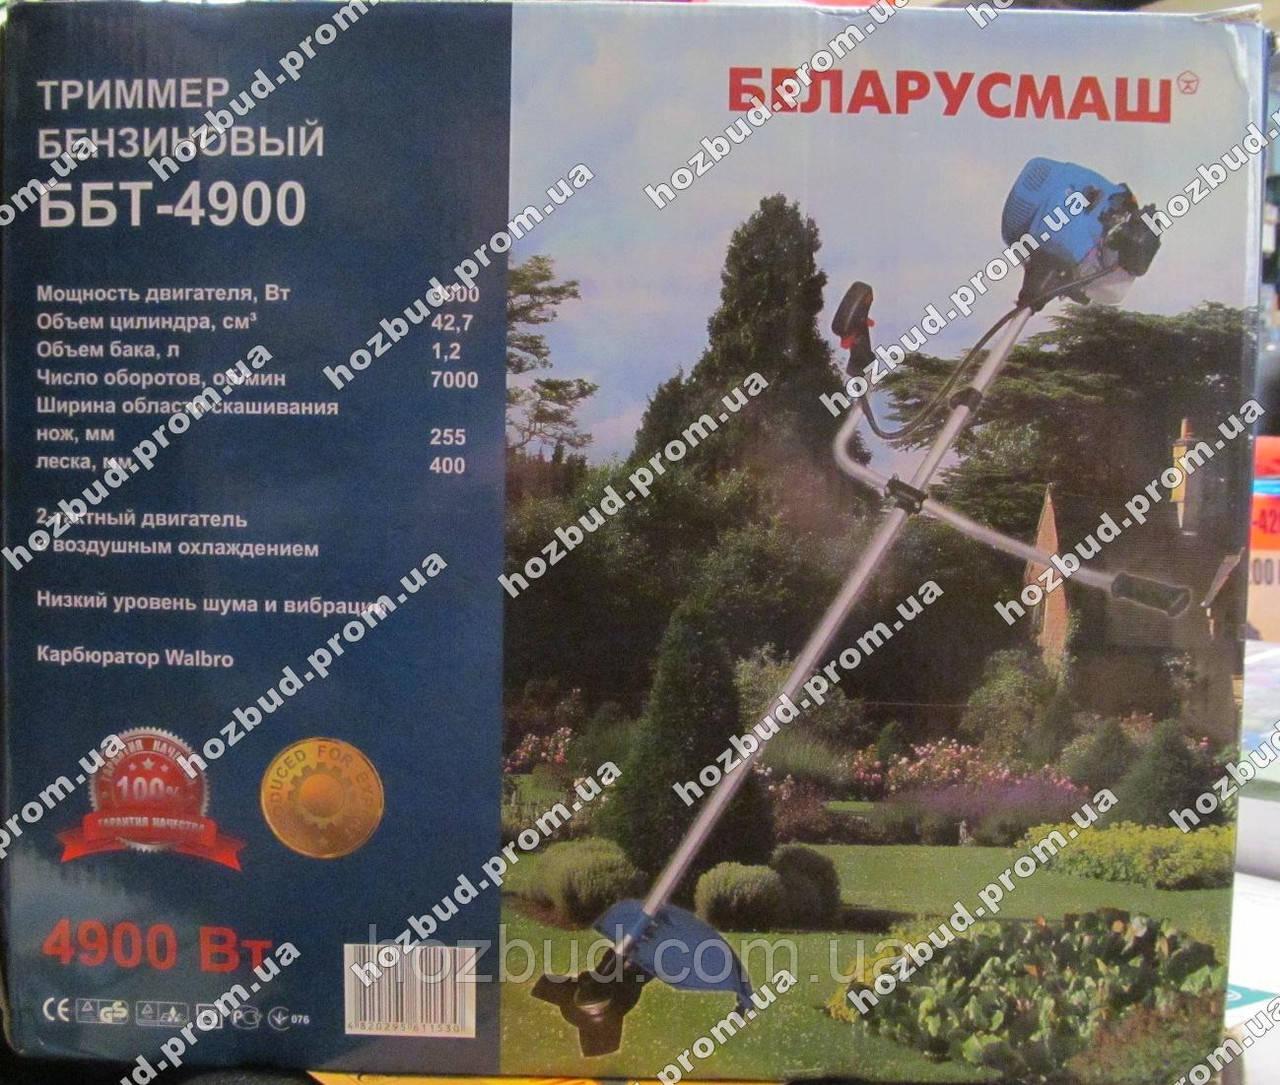 Бензокоса Беларусмаш ББТ-4900